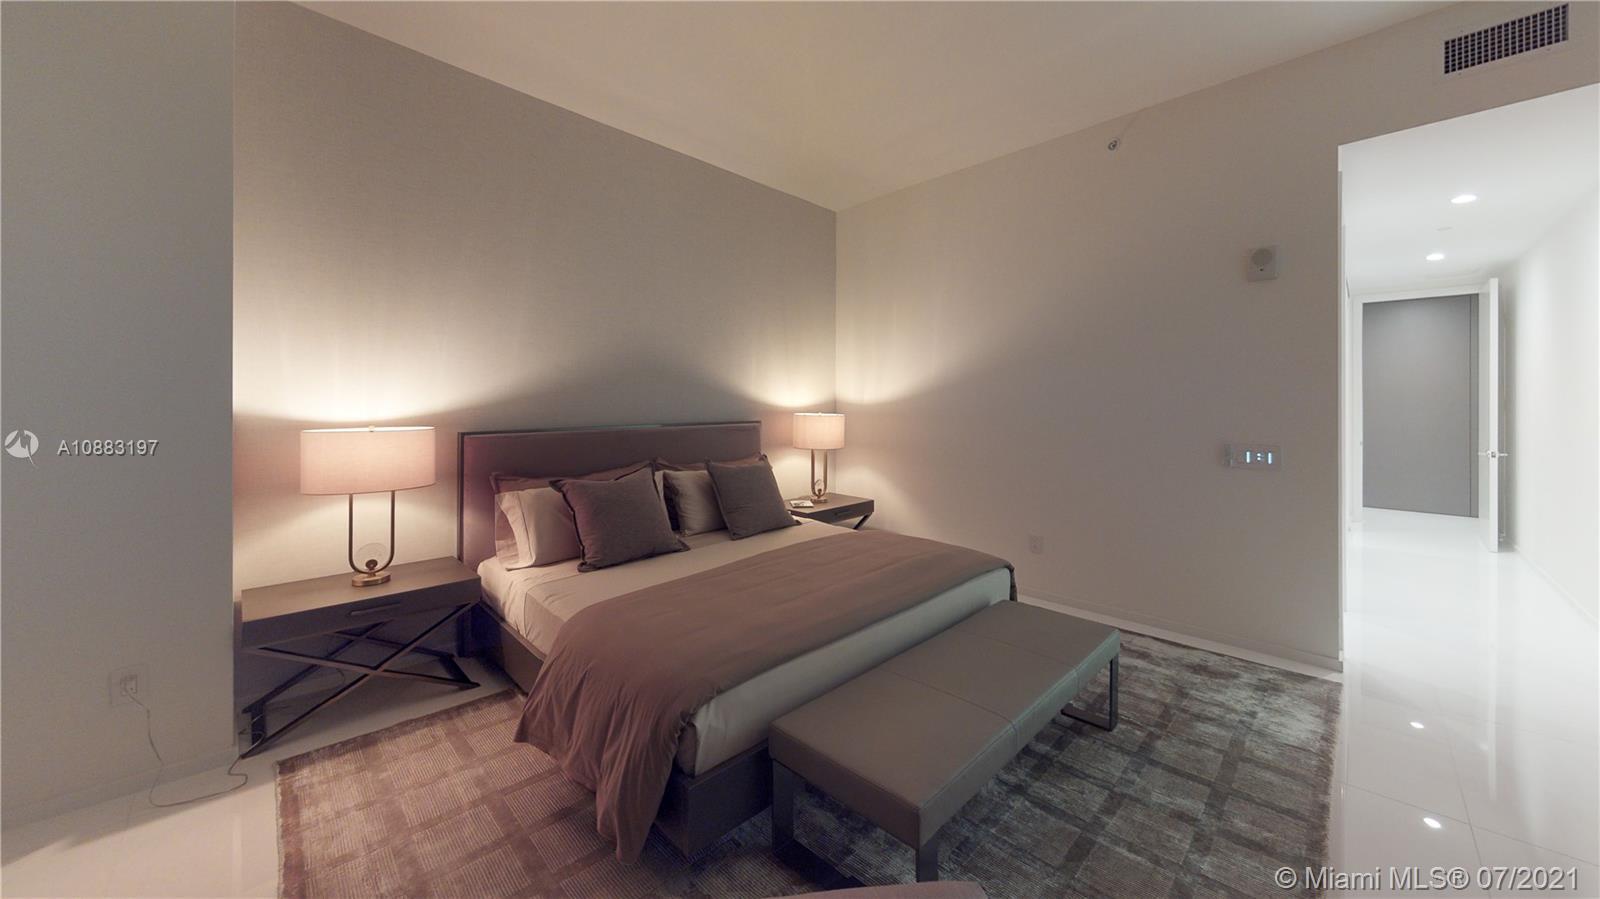 FENDI Chateau Residences, 9349 Collins Ave Unit 506, Surfside, Florida 33154, image 41